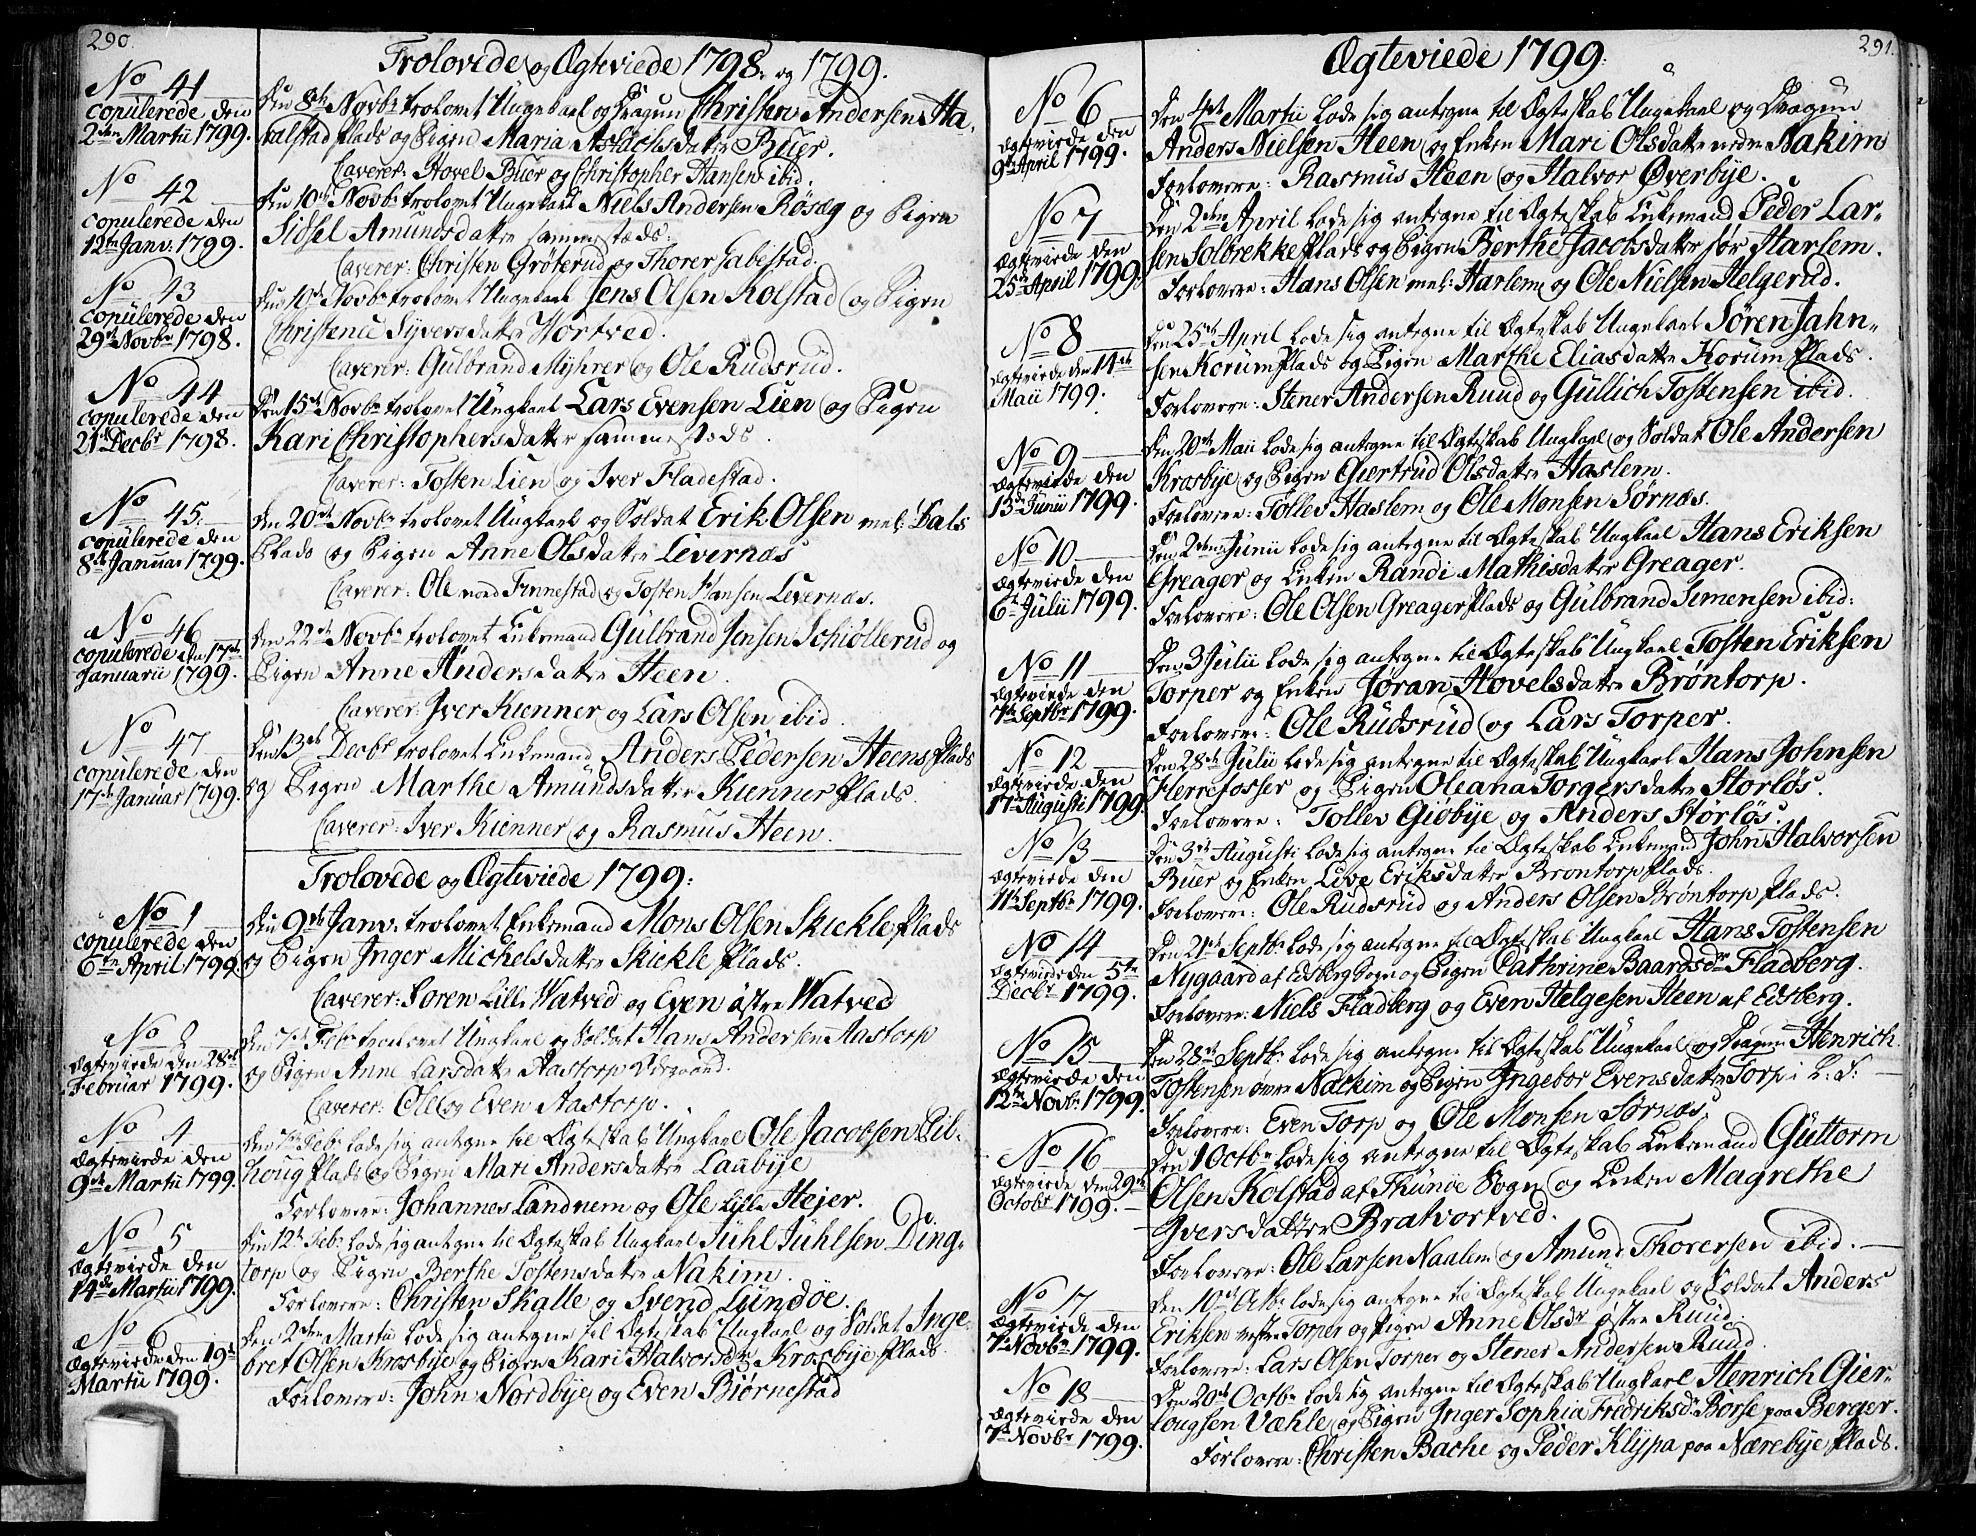 SAO, Rakkestad prestekontor Kirkebøker, F/Fa/L0005: Ministerialbok nr. I 5, 1784-1814, s. 290-291